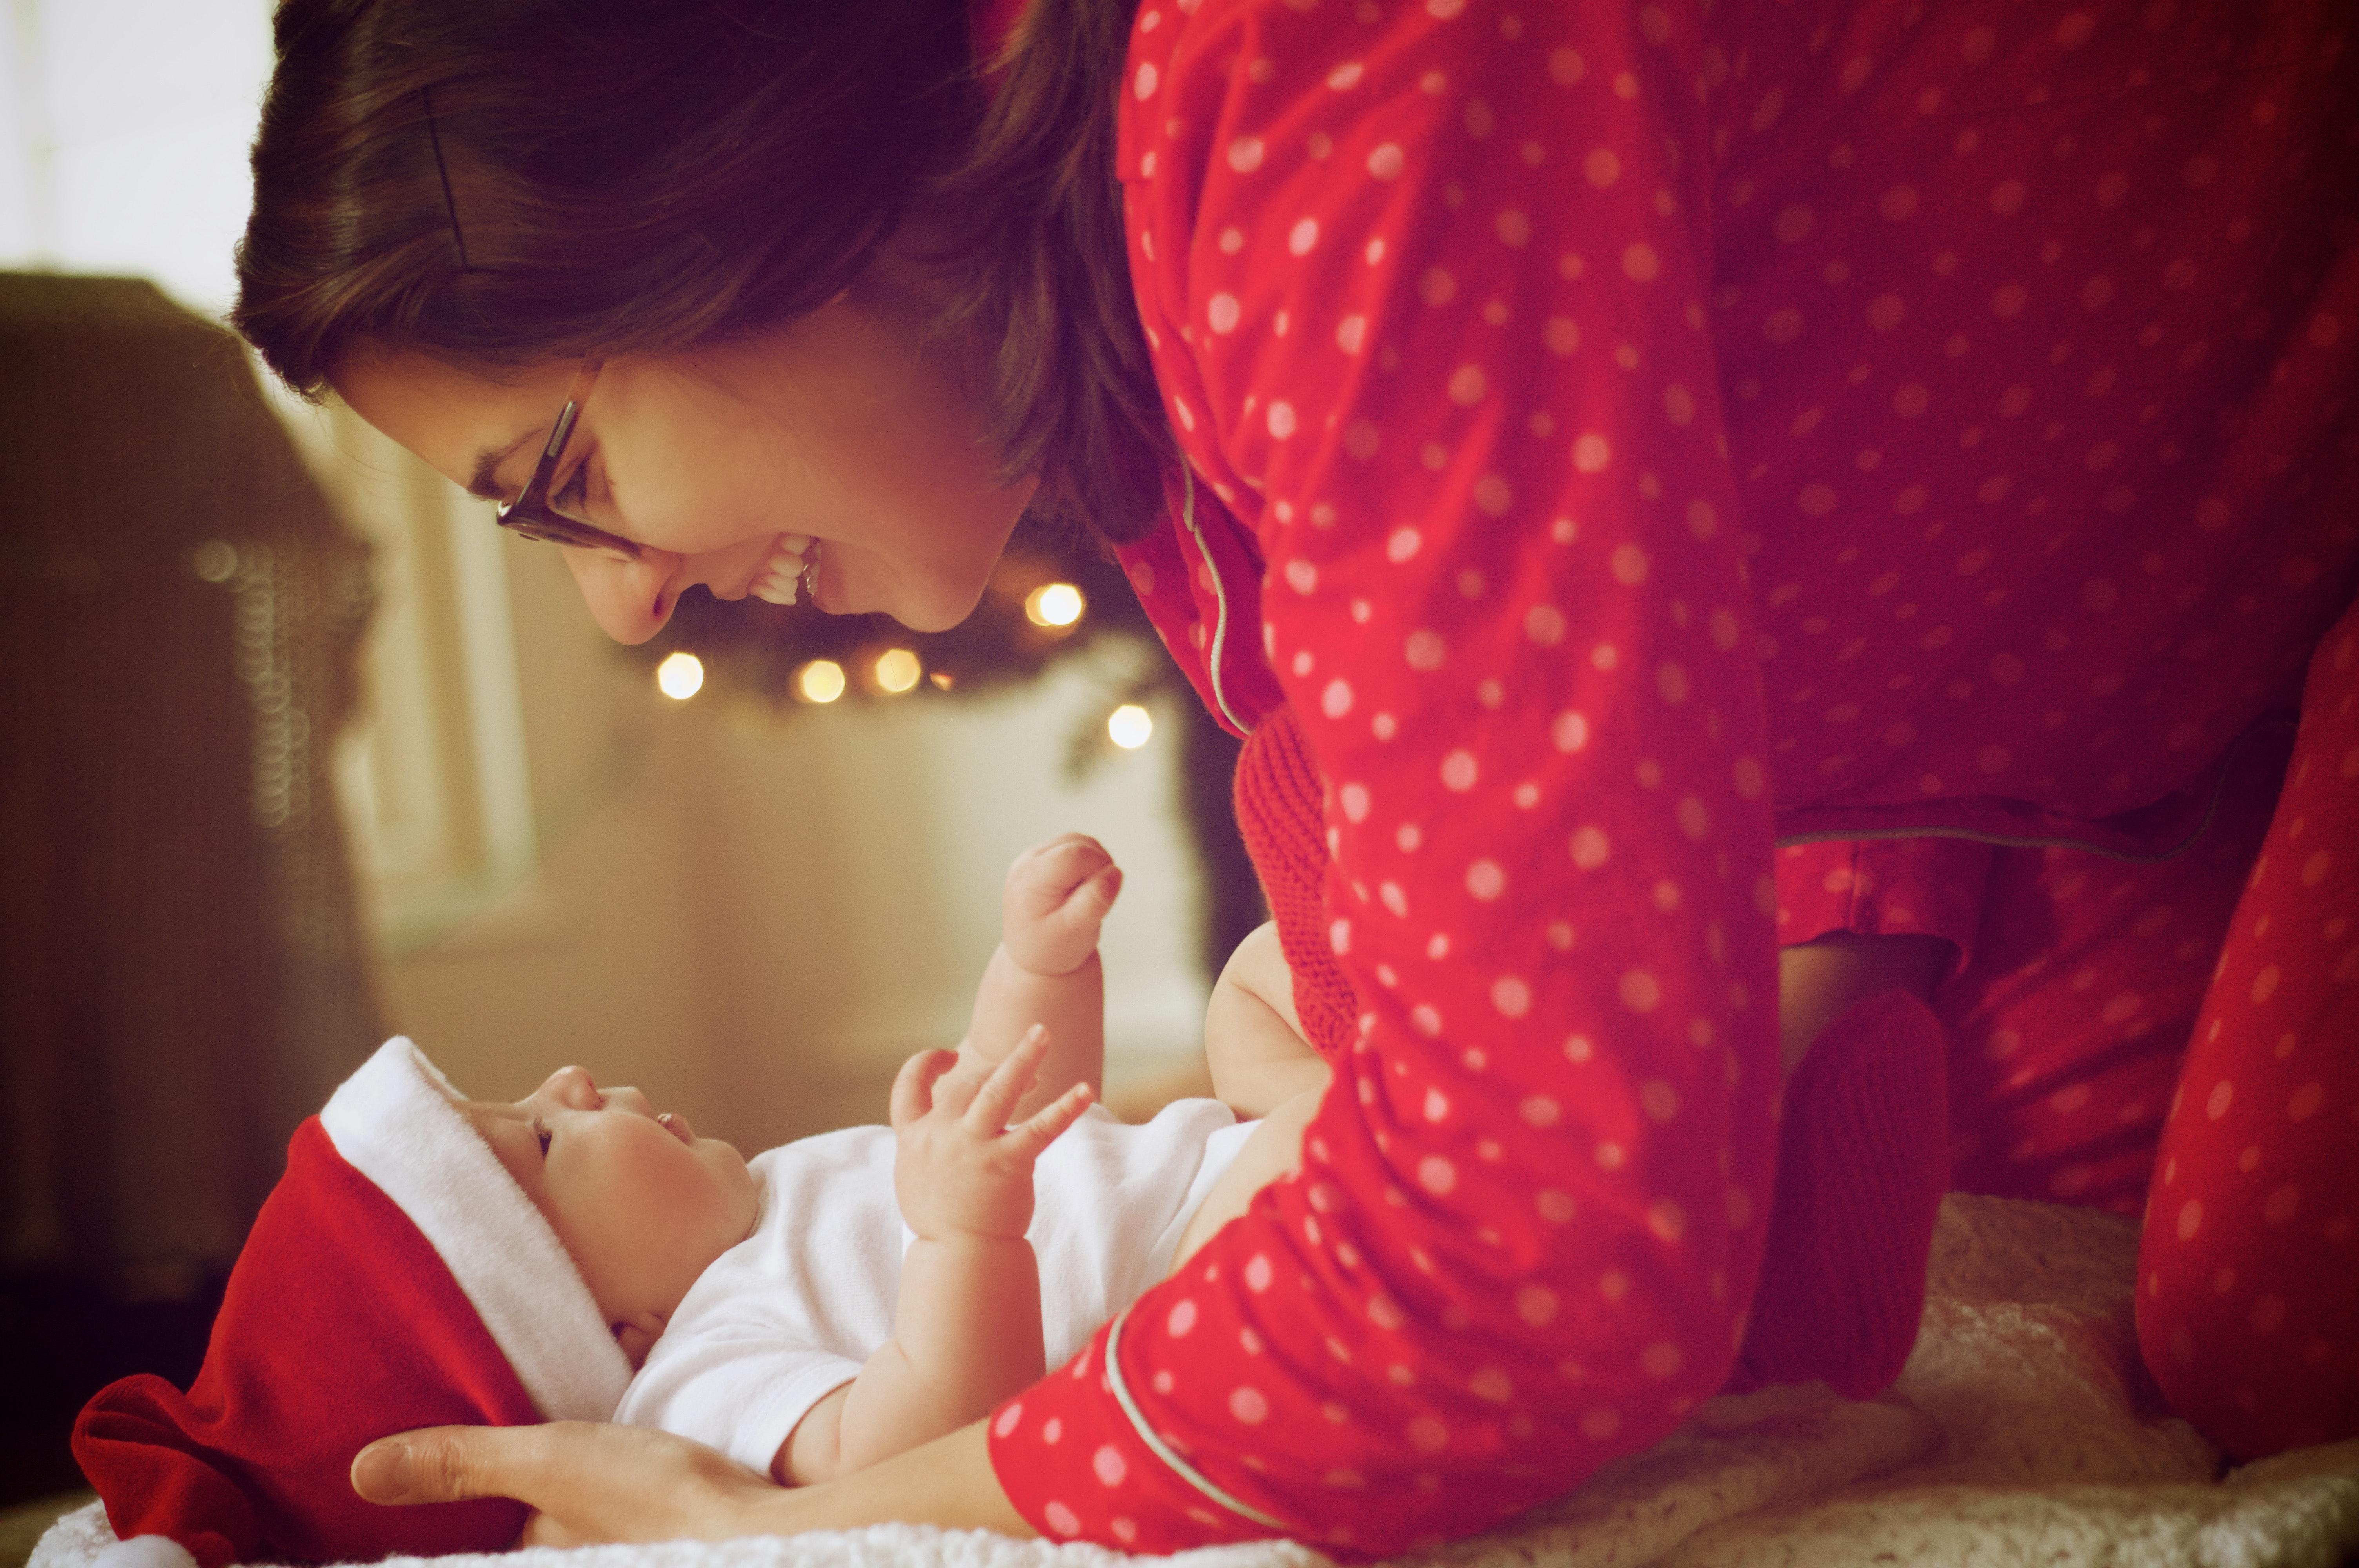 adult baby boy 249211 - Professional Polygraph Testing